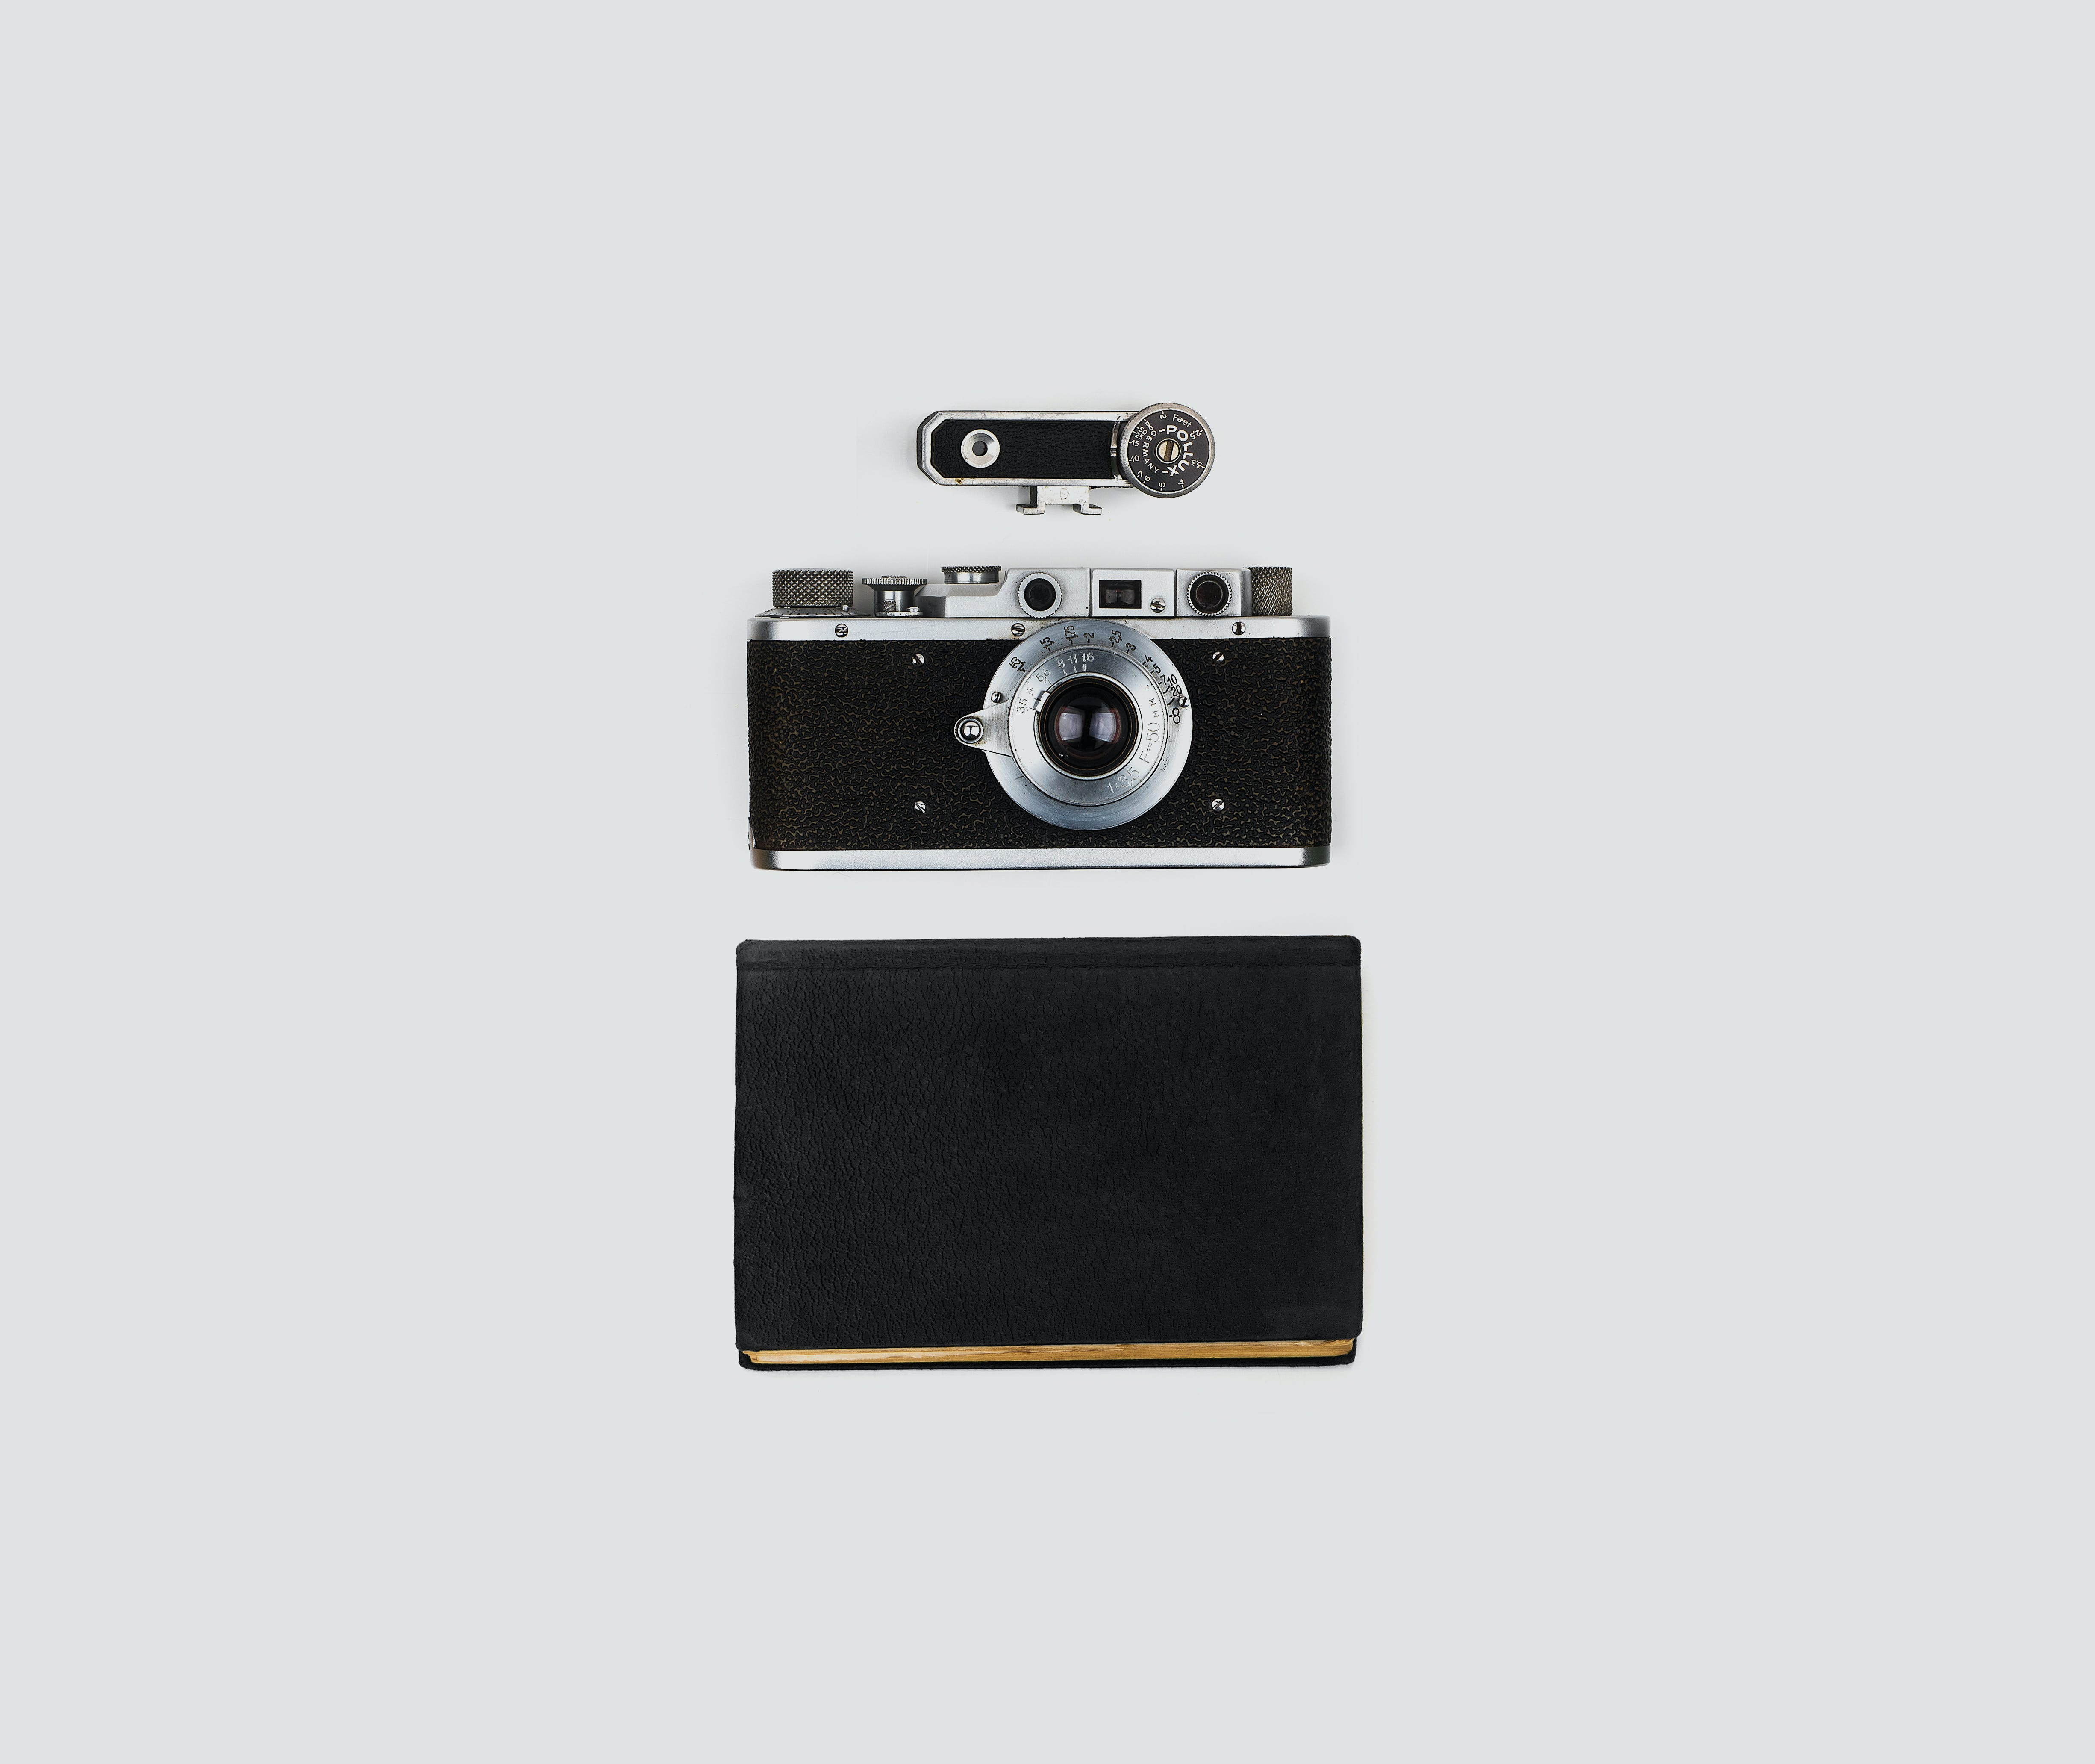 Foto stok gratis berfokus, fotografi, kamera, kamera lama